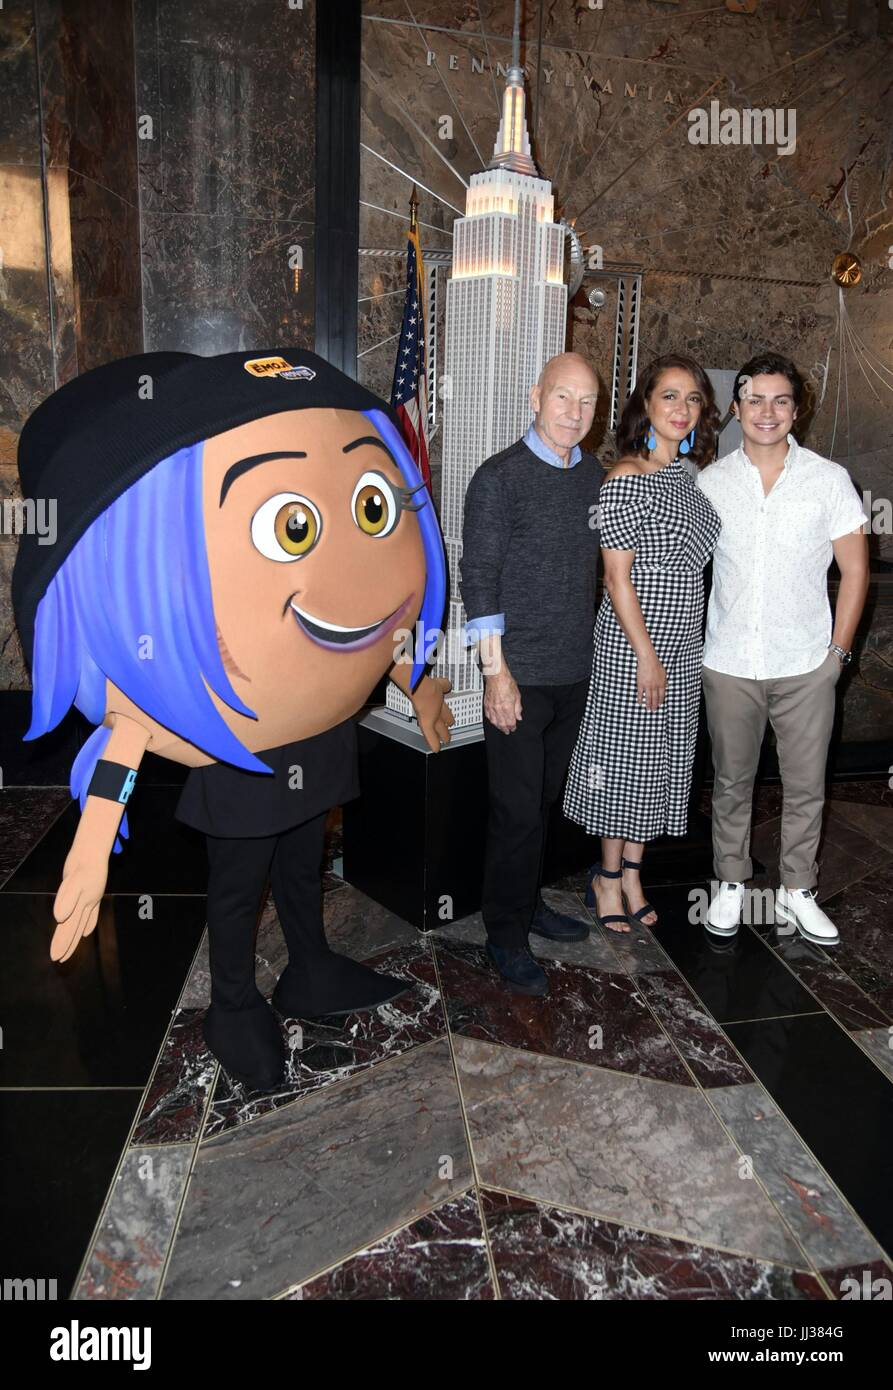 New York, NY, USA. 17th July, 2017. Jake T. Austin, Maya Rudolph, Patrick Stewart in attendance for THE EMOJI MOVIE - Stock Image